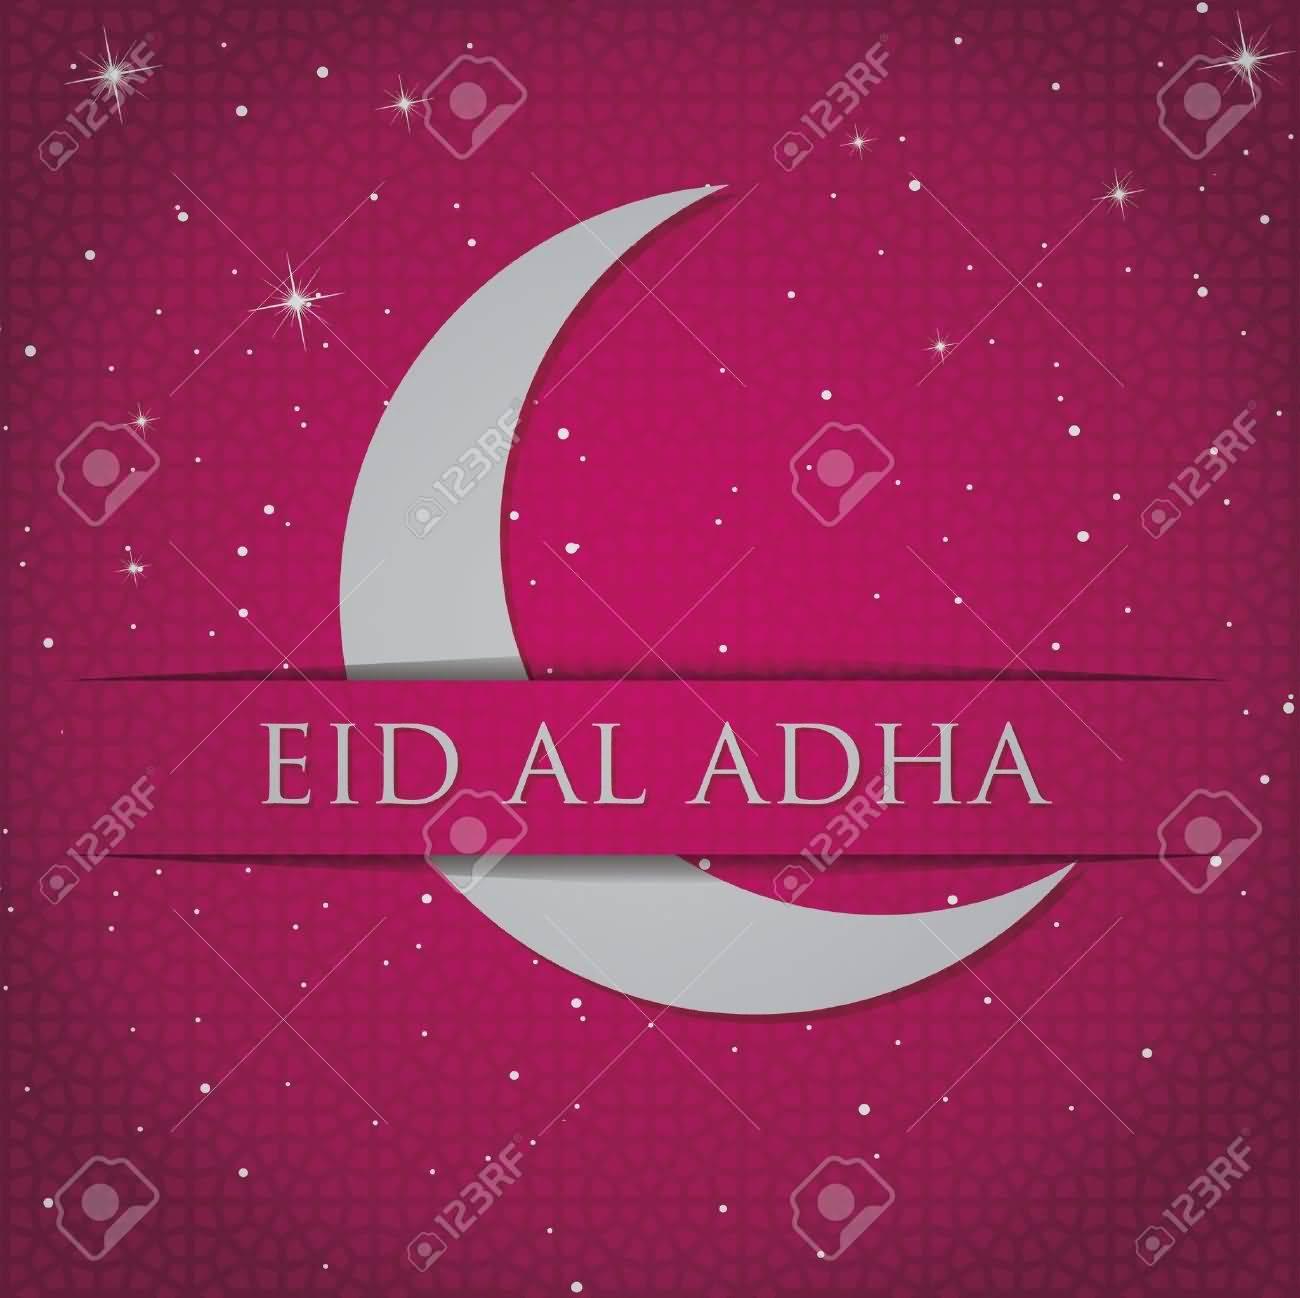 65 best eid ul adha 2016 greeting photos and images eid al adha 2016 half moon greeting card kristyandbryce Images